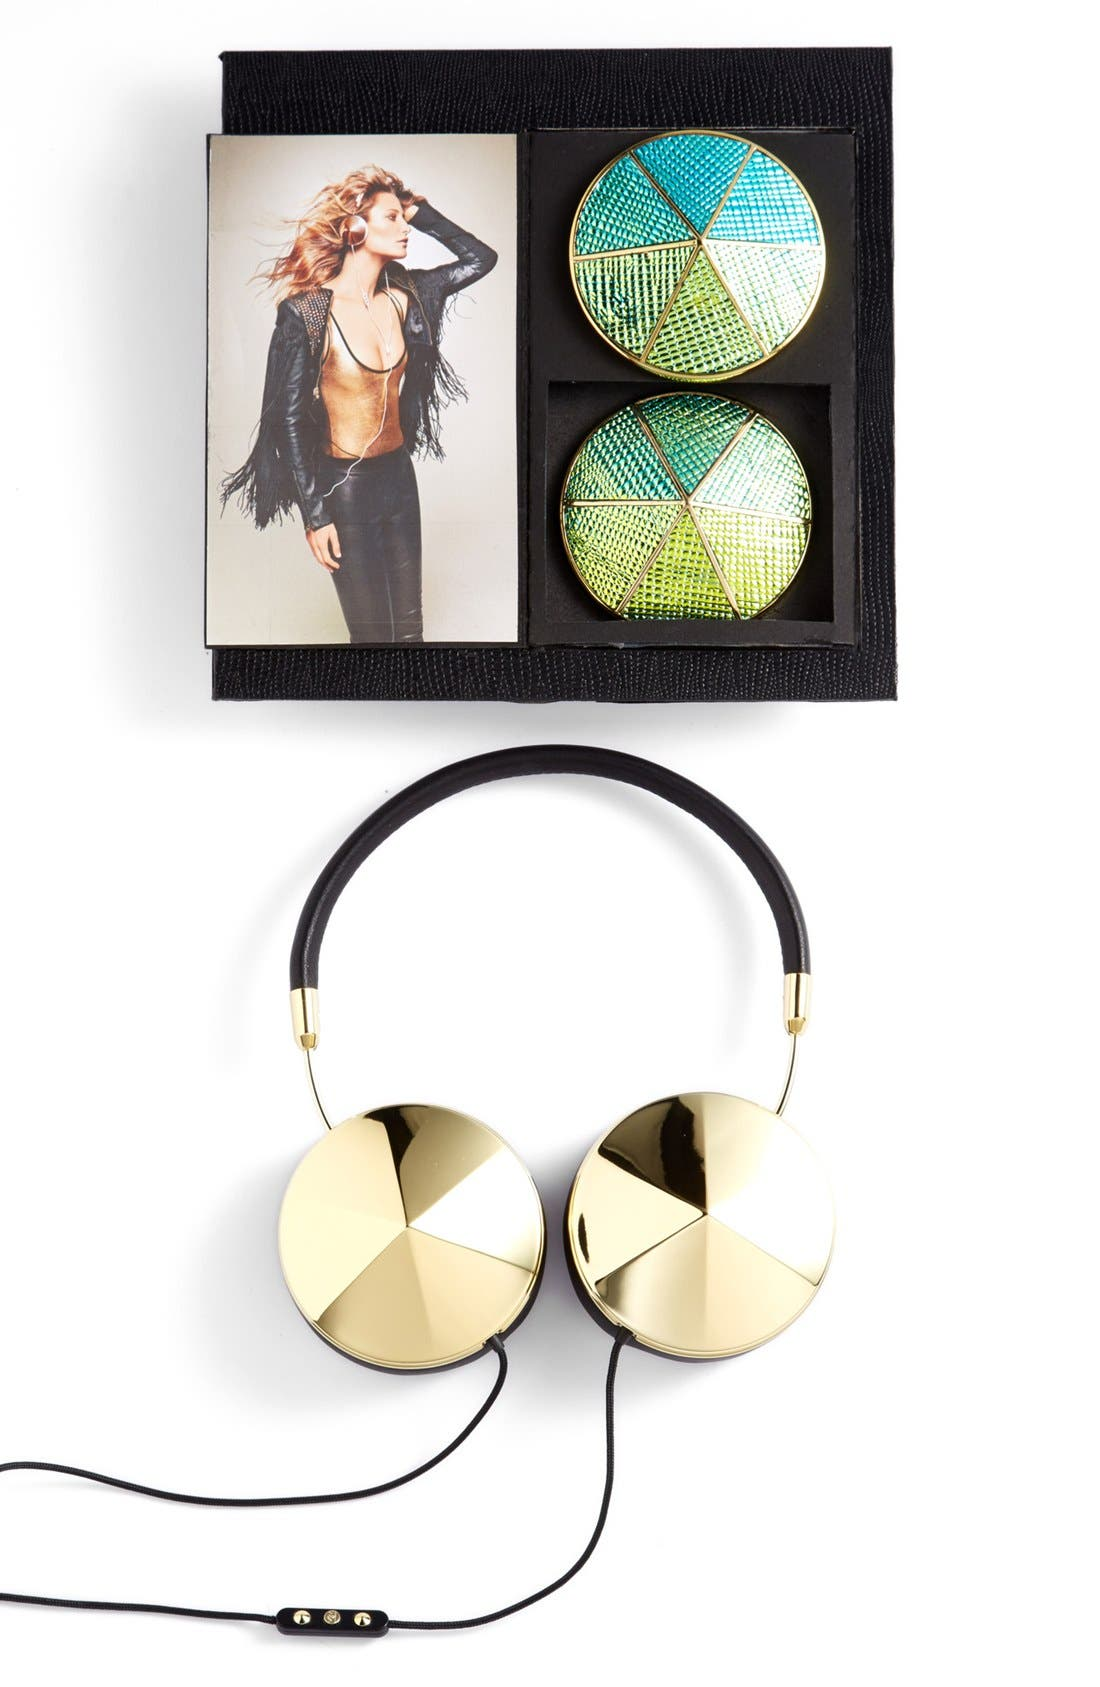 Main Image - Frends 'Taylor - Rebecca Minkoff' Headphones